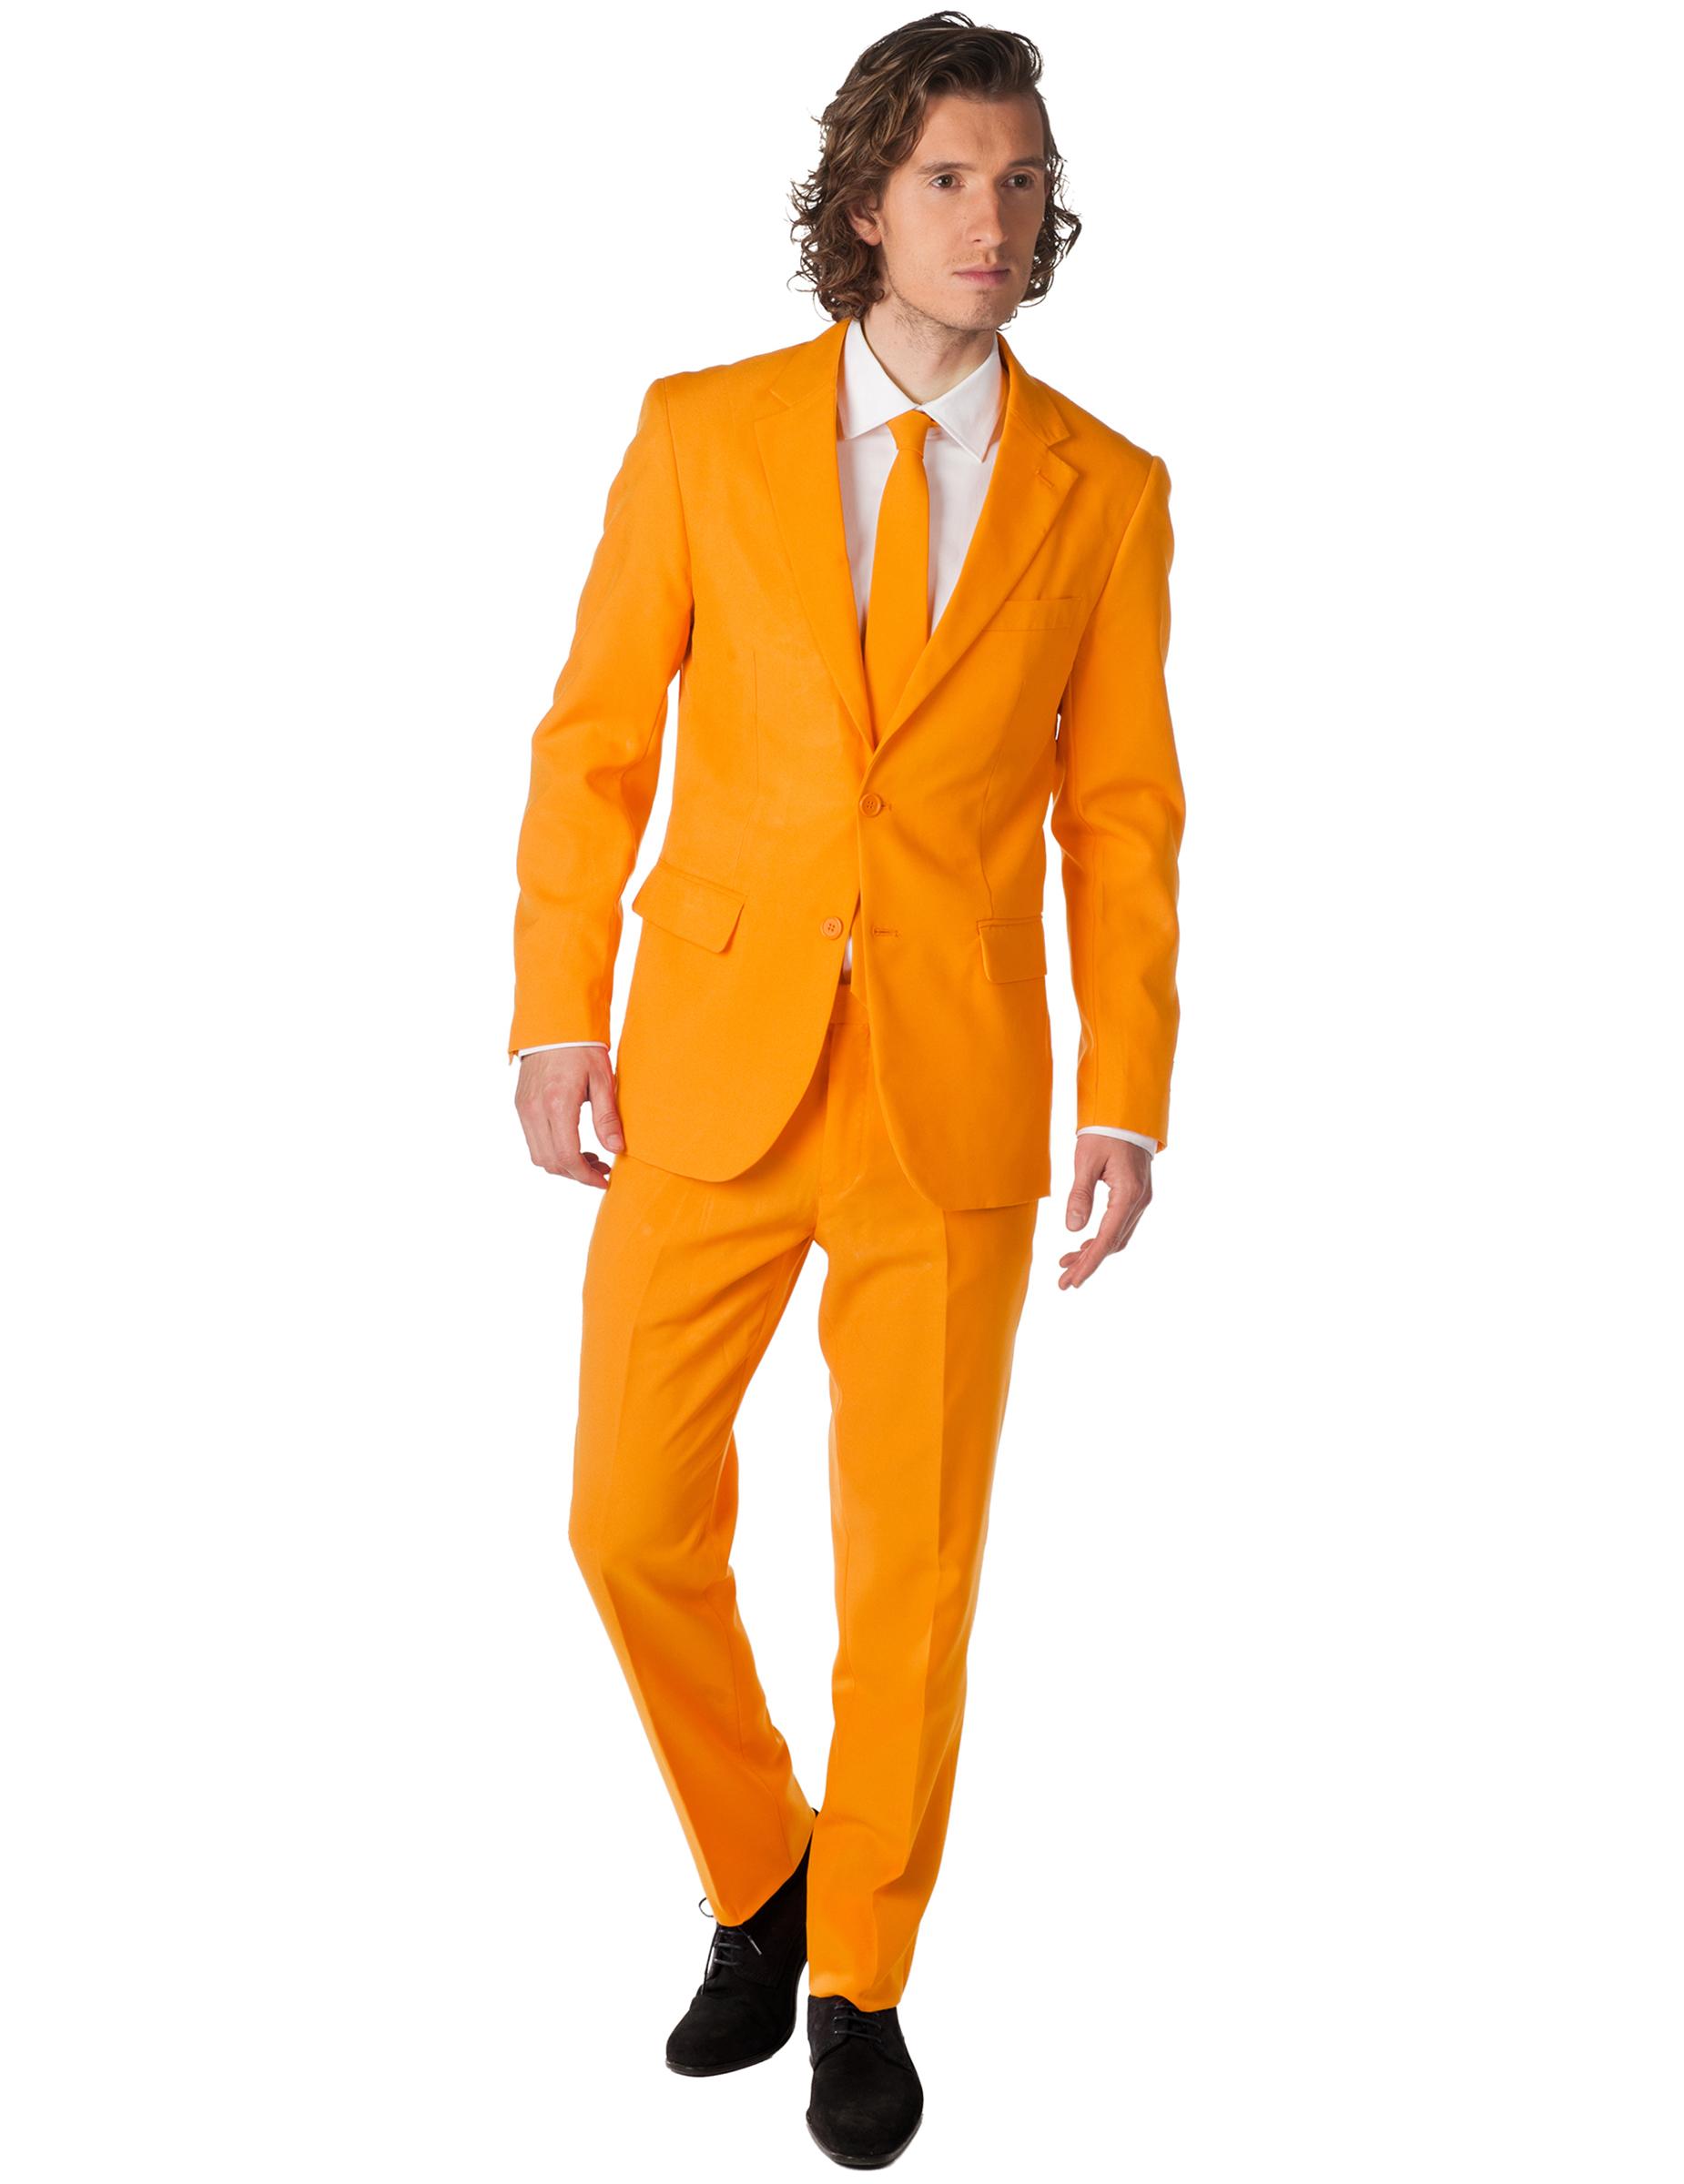 4354f9dafb79 Costume Mr.arancione per uomo Opposuits™